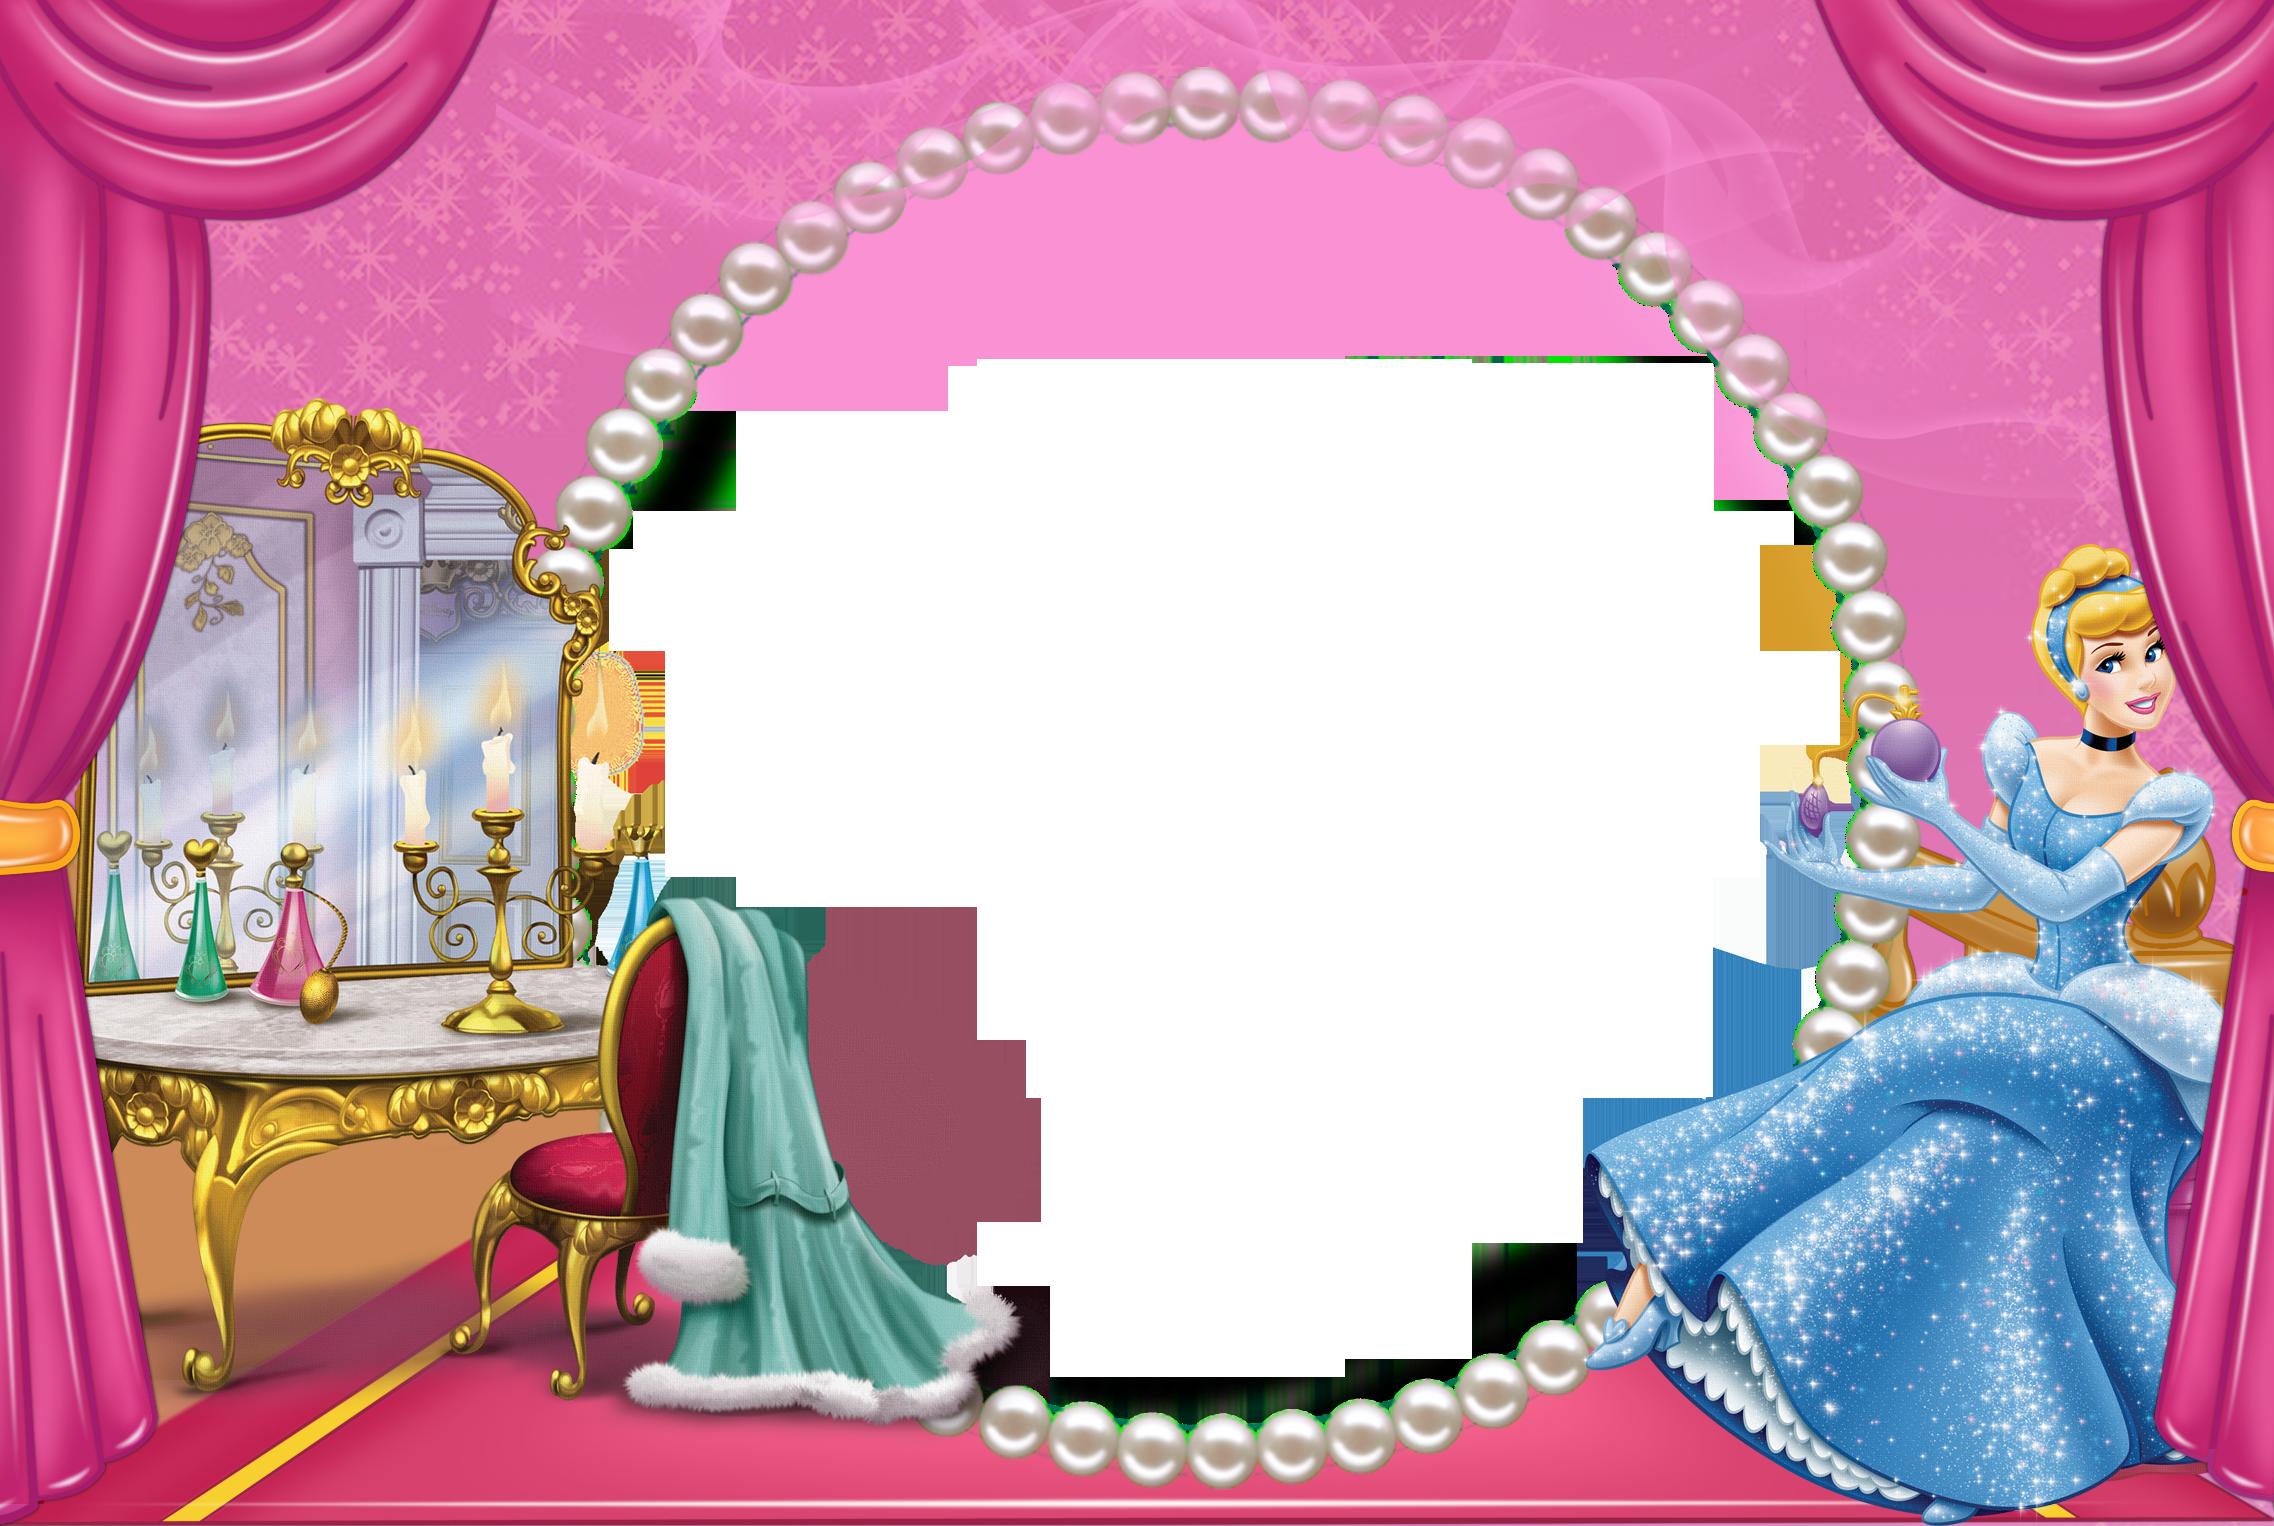 Cinderella clipart frame. Pink cute kids transparent